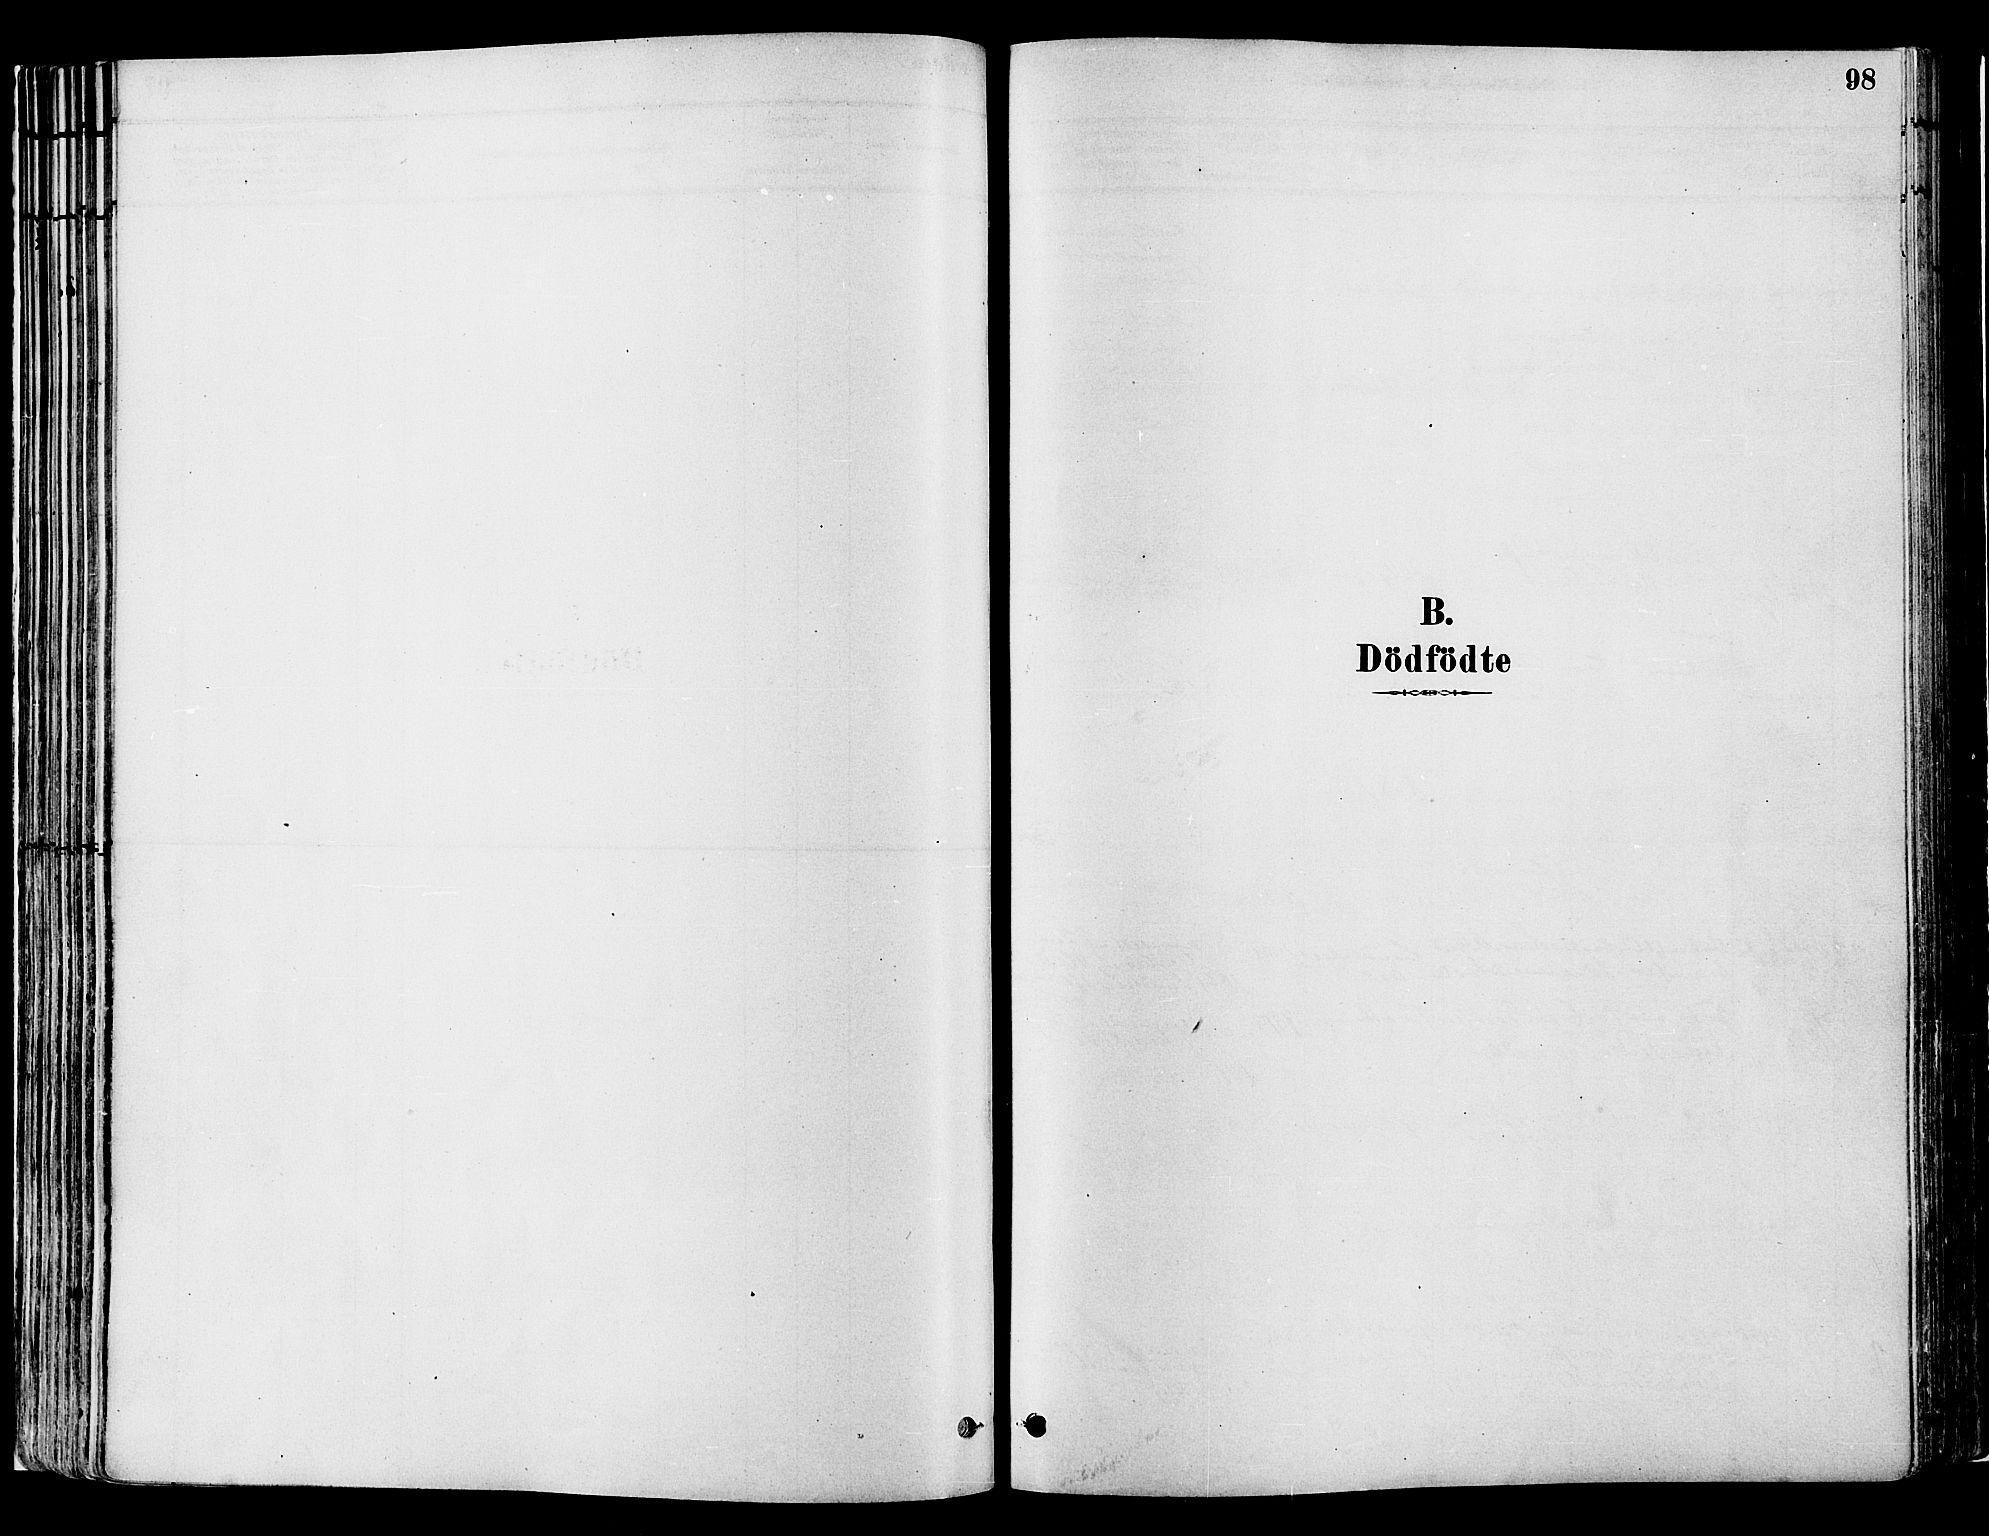 SAH, Gran prestekontor, Ministerialbok nr. 14, 1880-1889, s. 98